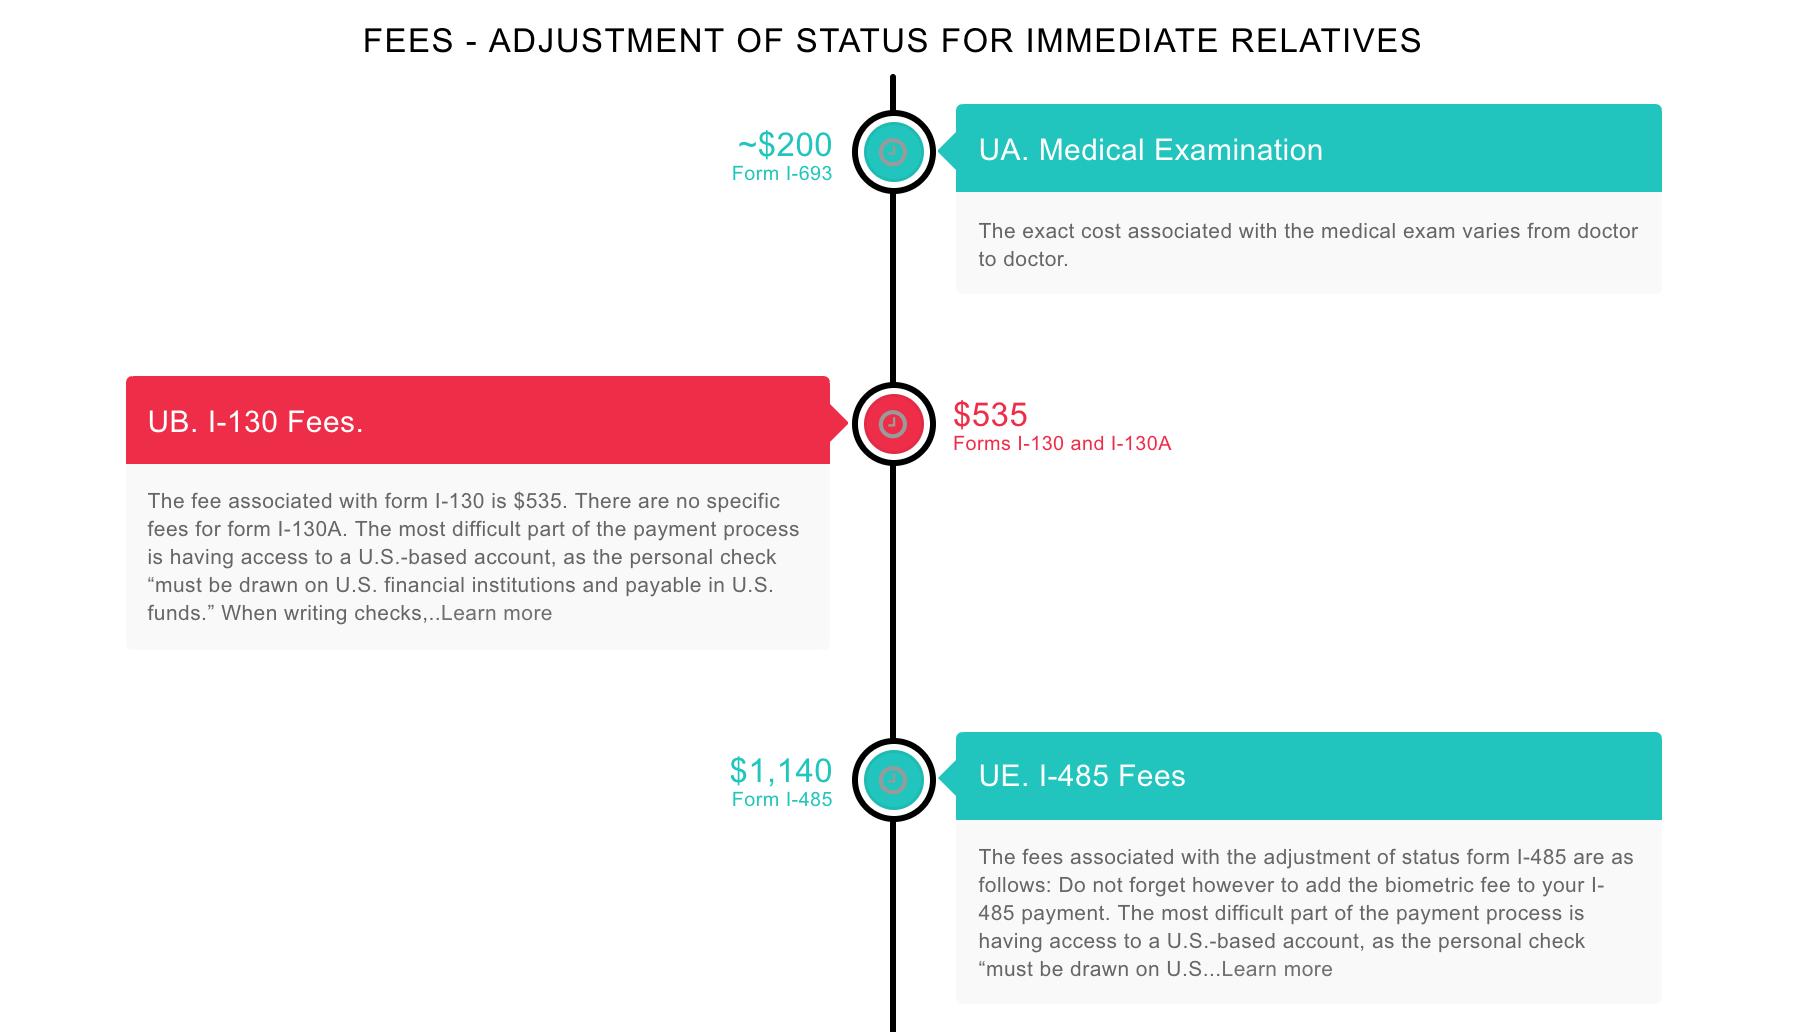 Adjustment of Status for Immediate Relatives